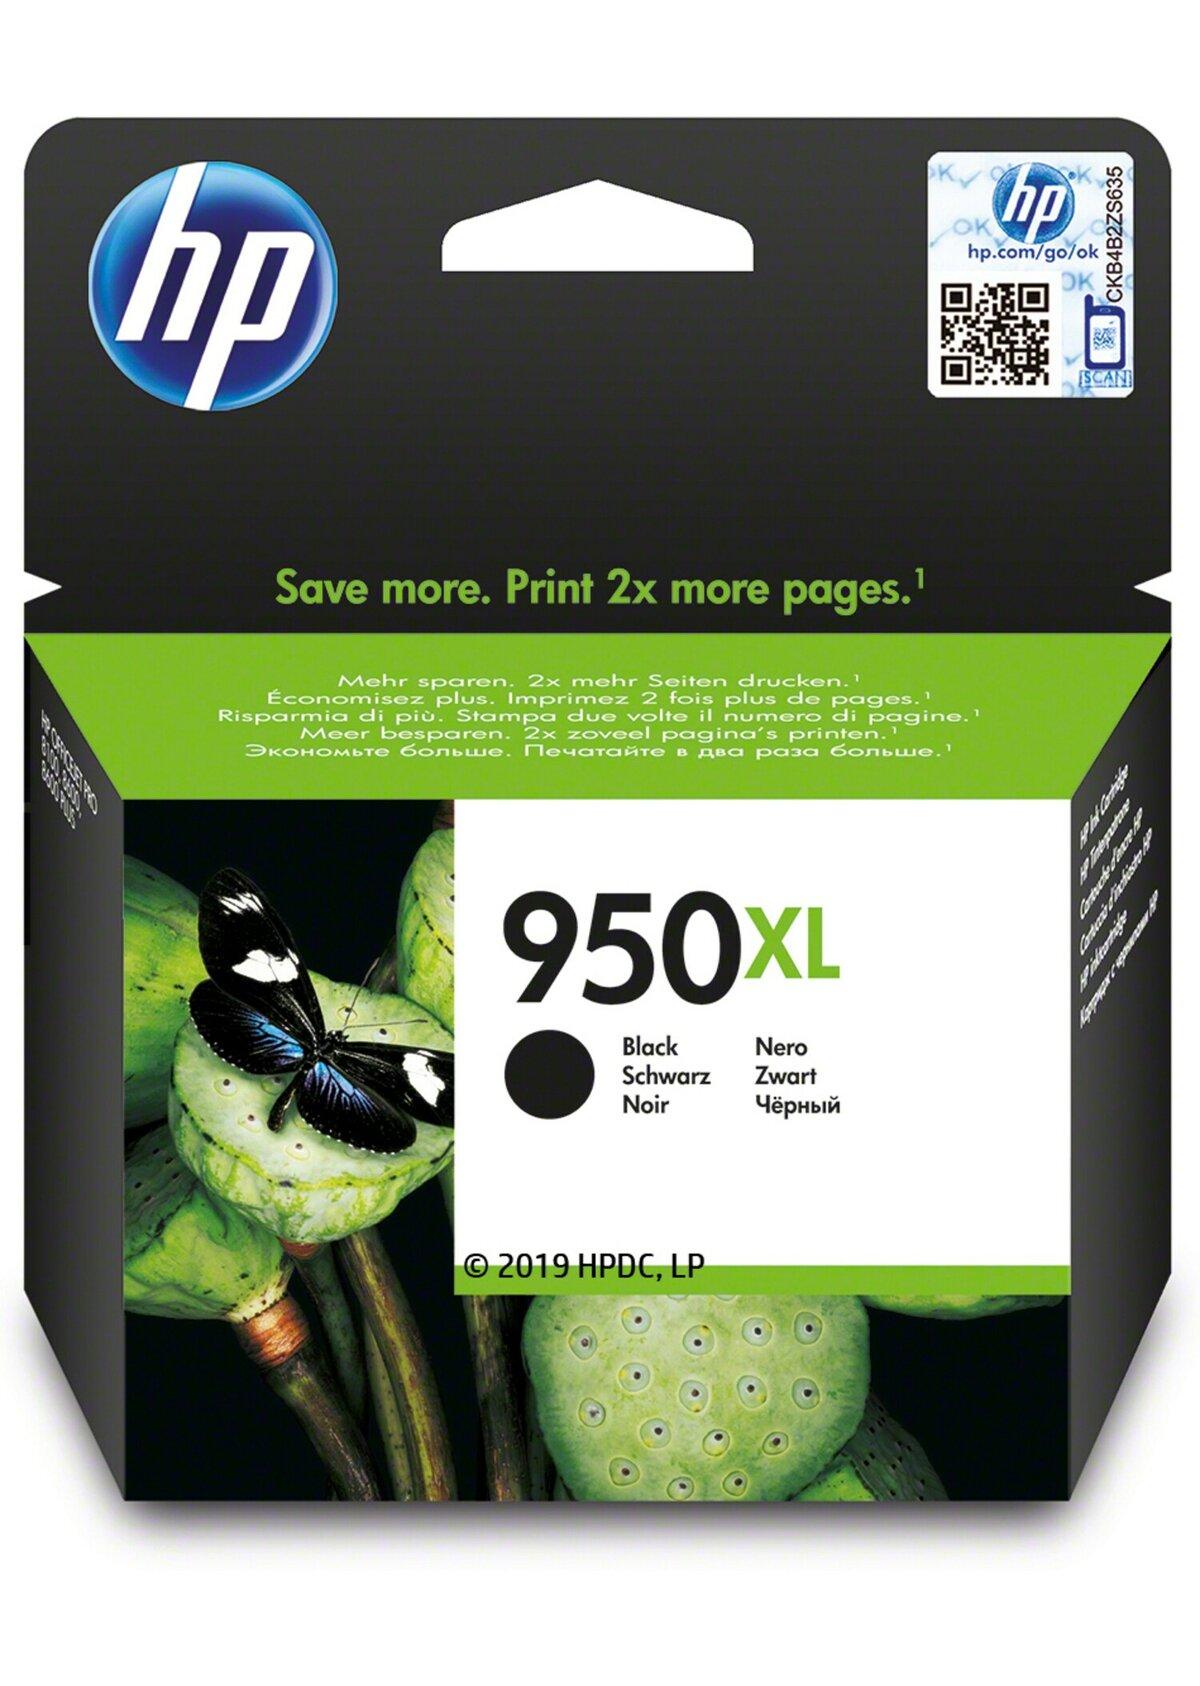 CN045AE HP 950XL High Yield Black Original Ink Cartridge